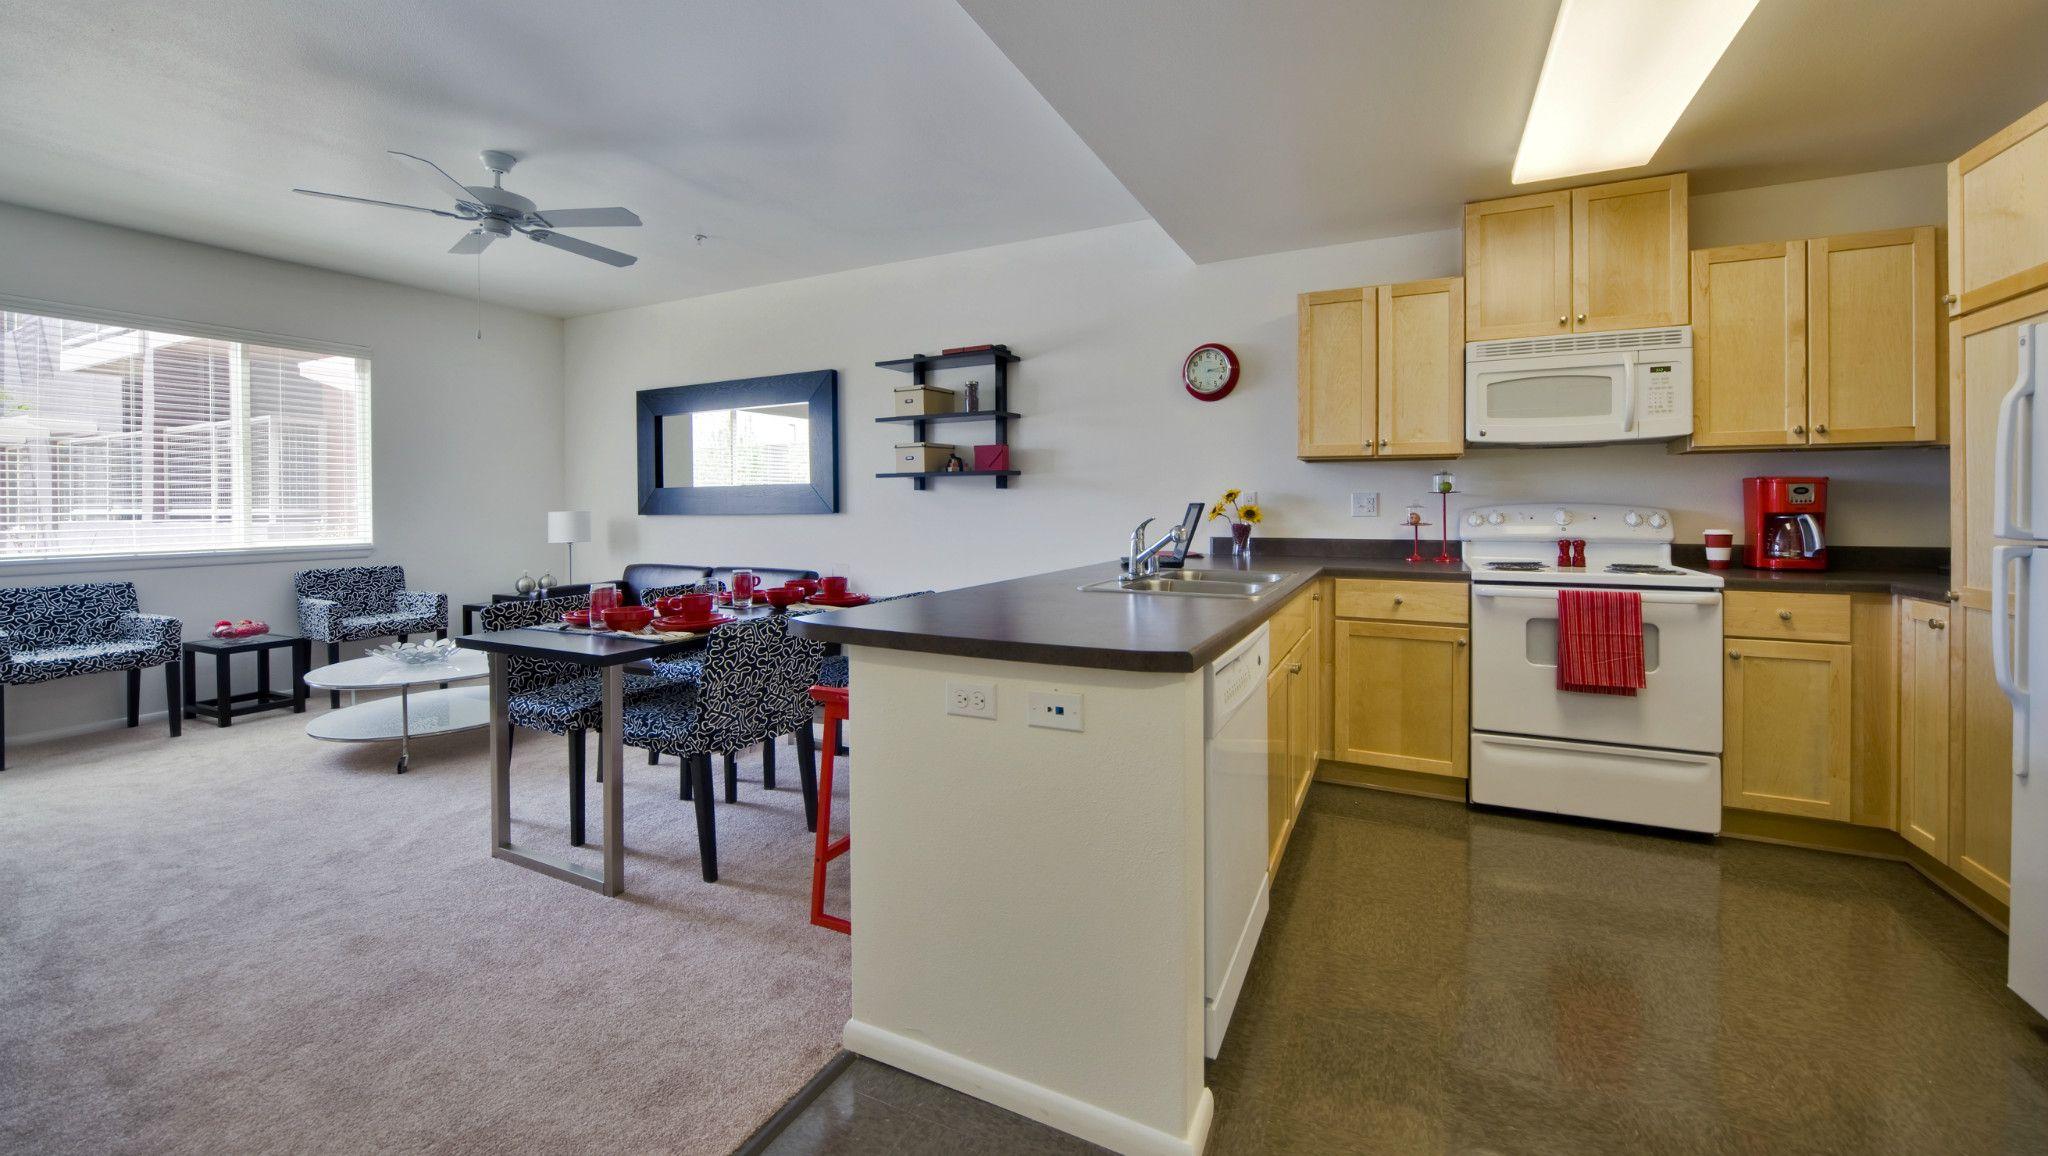 Silver Gardens Apartments (Albuquerque, NM) Affordable